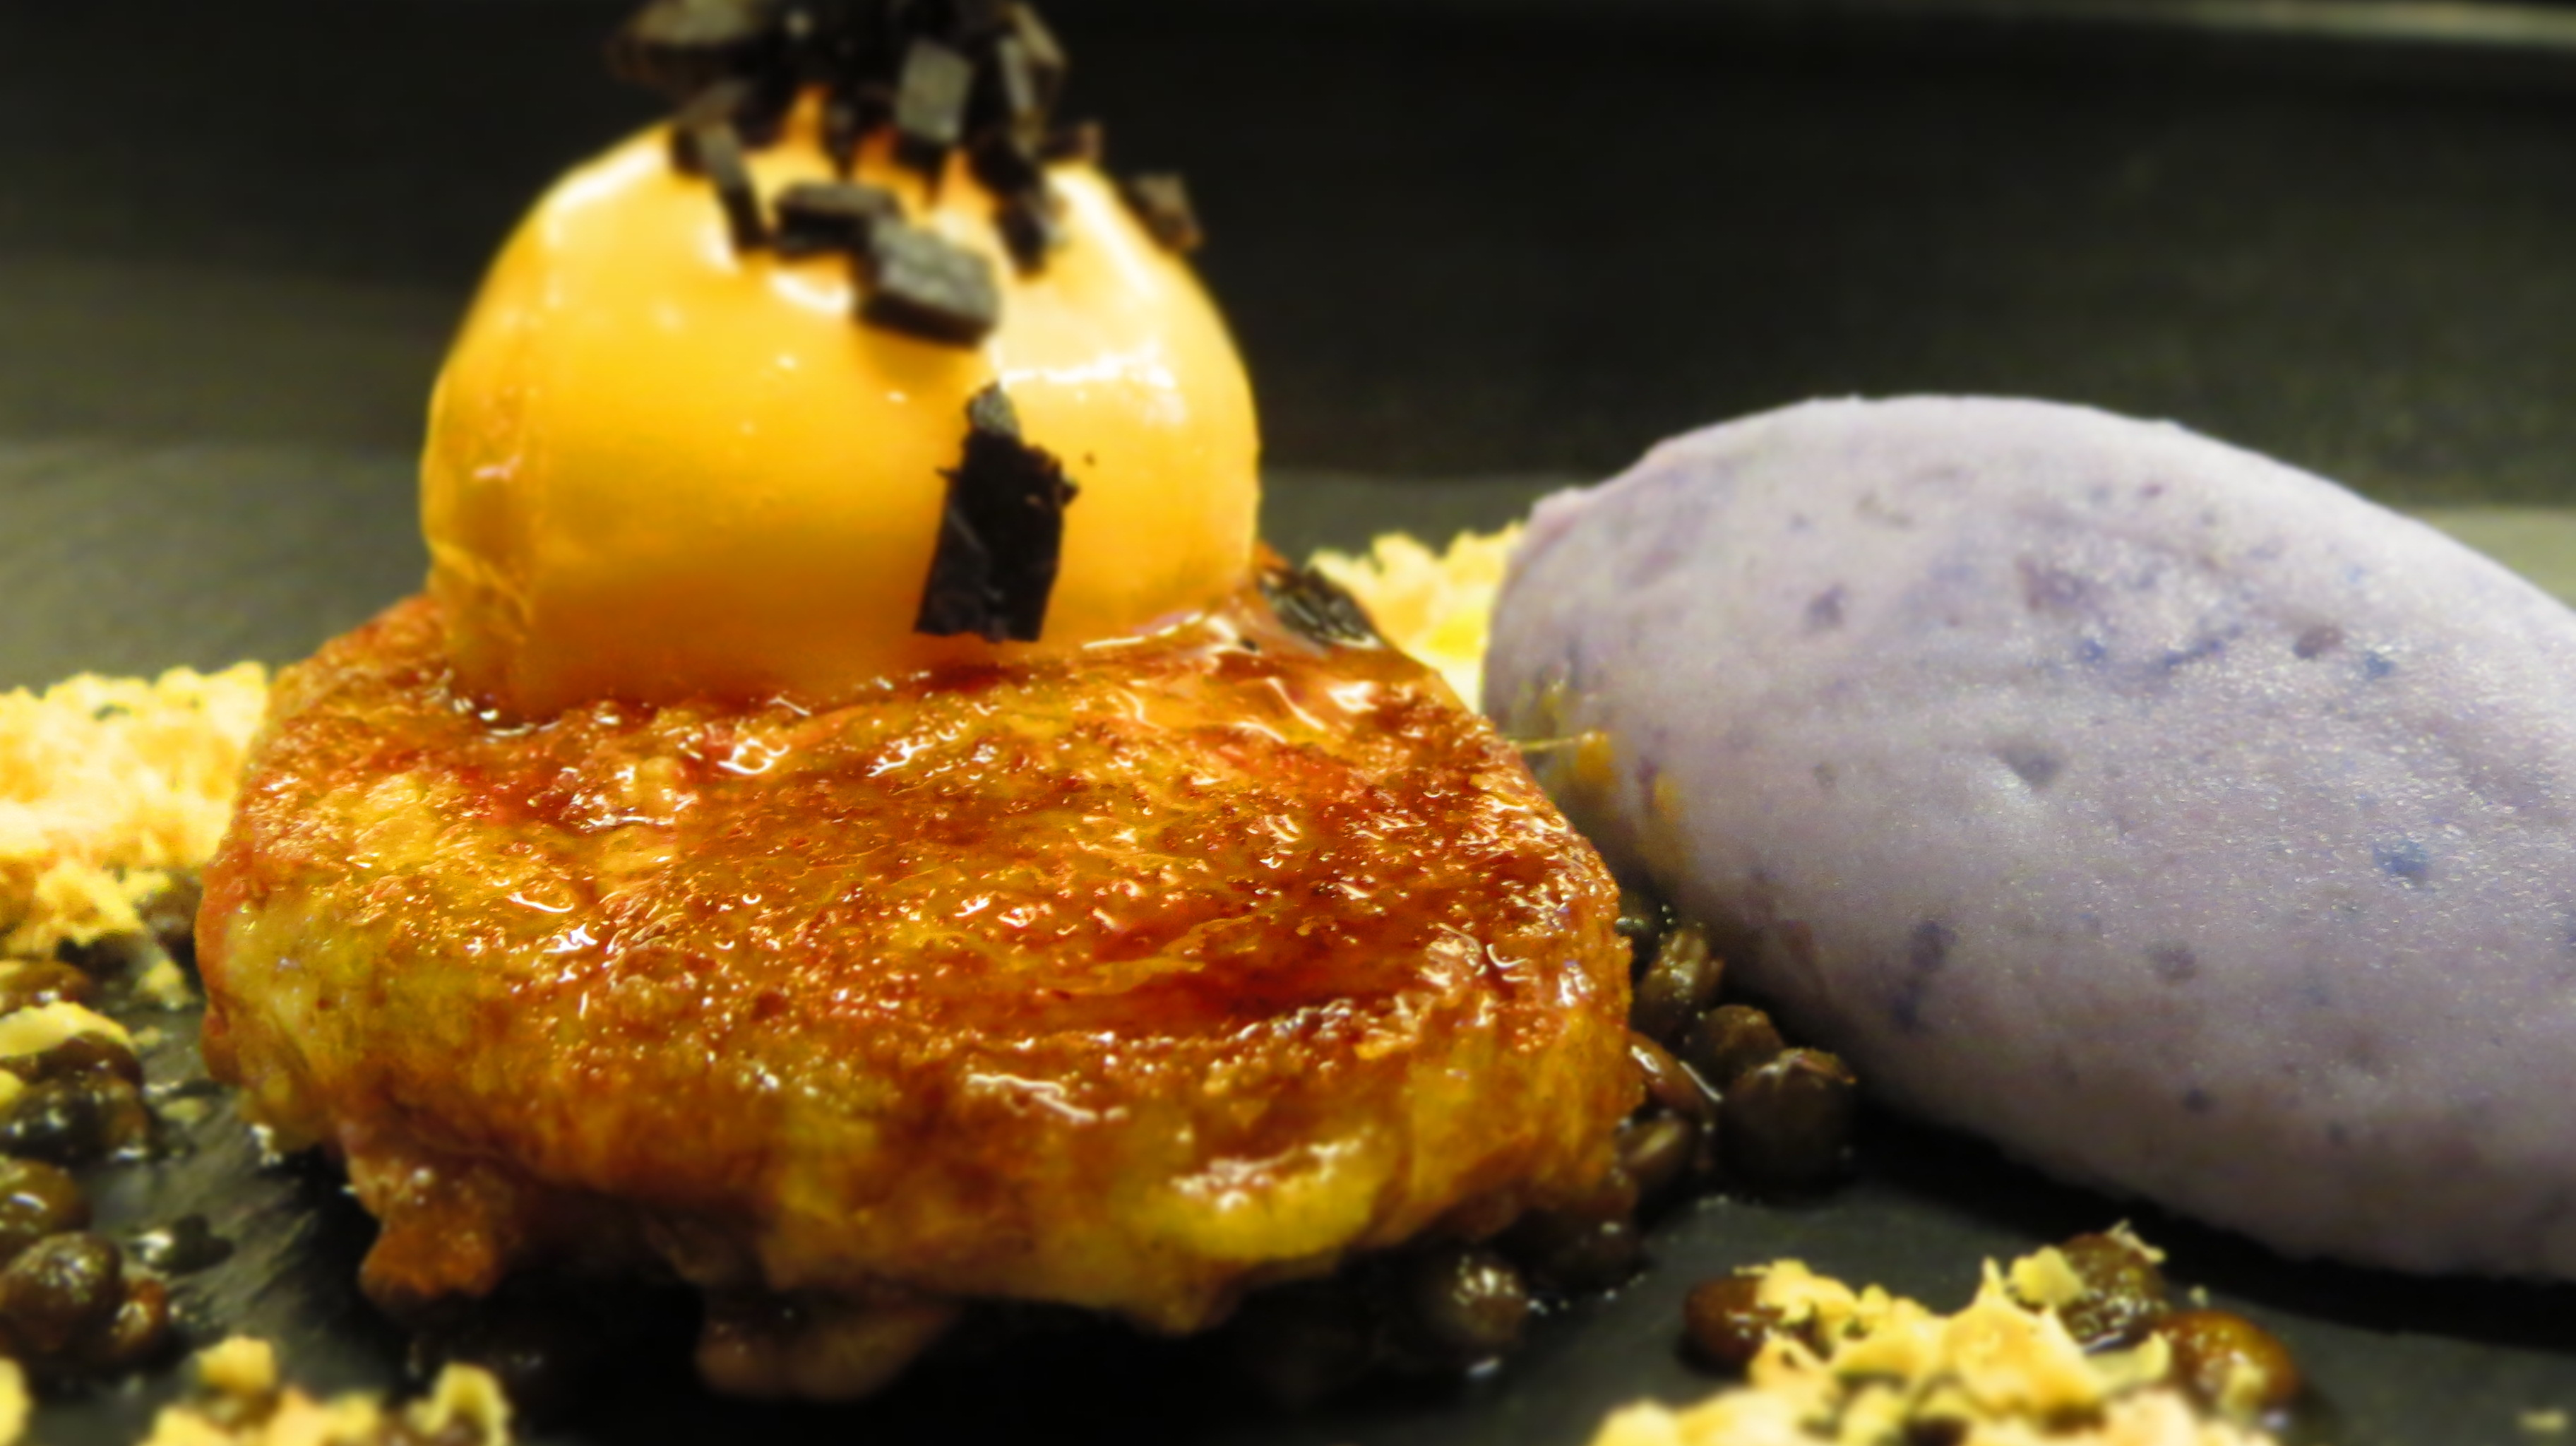 Foie gras - poached yolk - Vitelotte